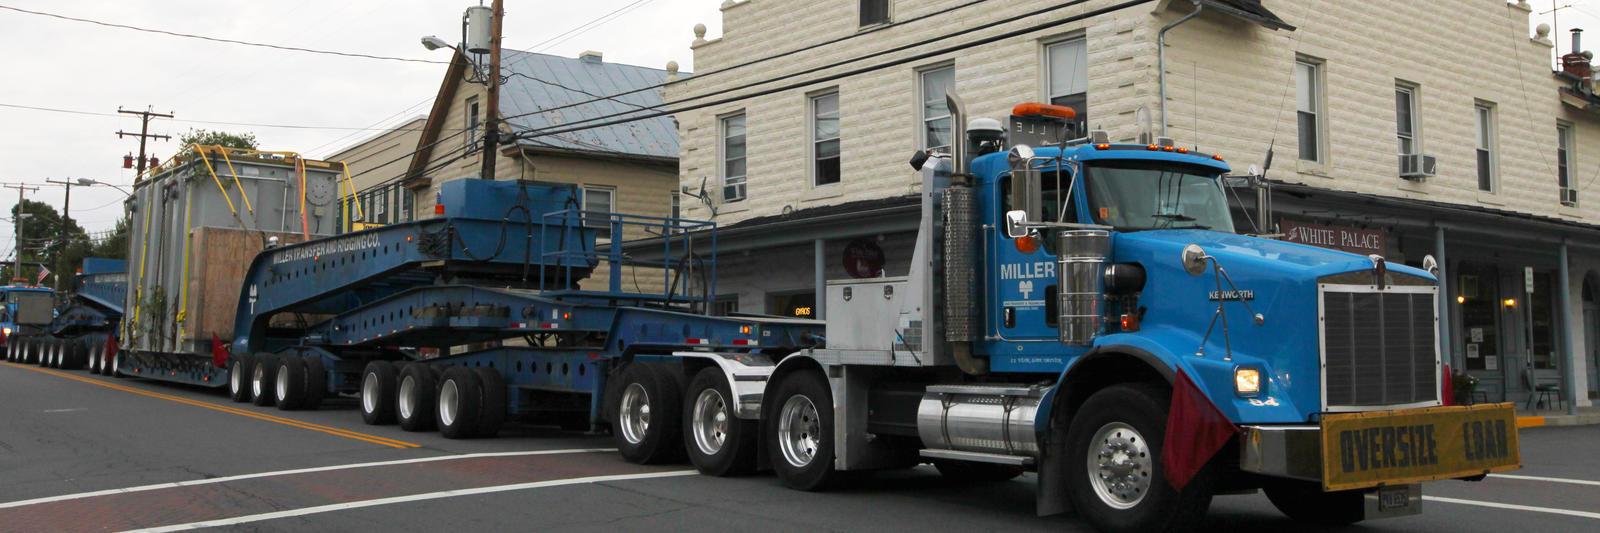 Heavy Haul Miller Transfer